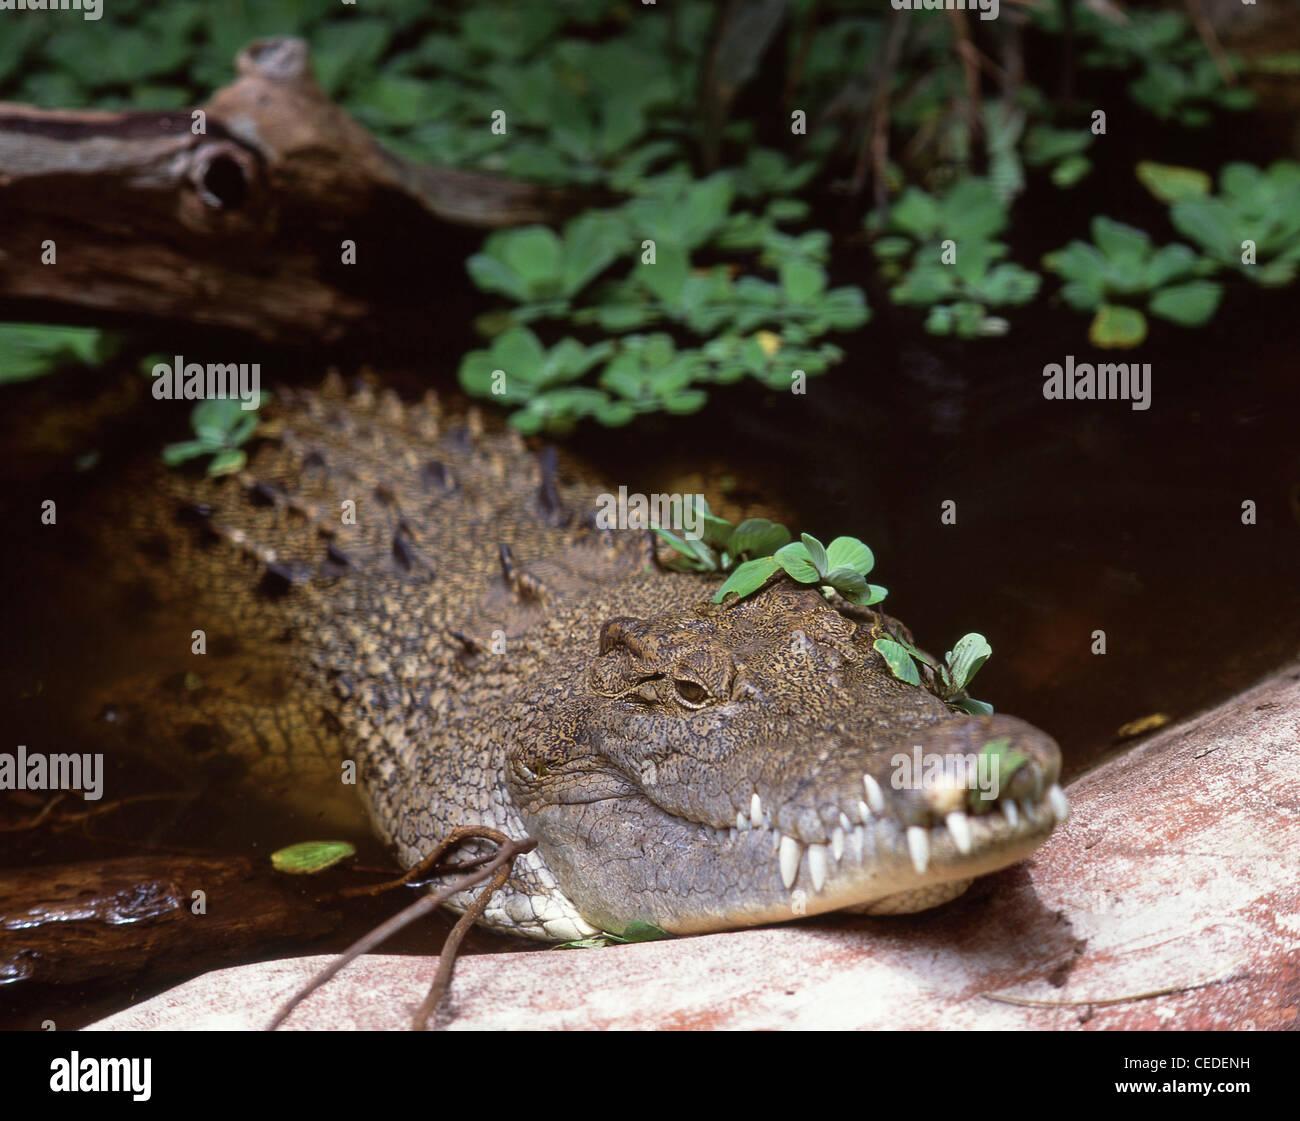 Le repos, crocodile Green Island, Great Barrier Reef Marine Park, Queensland, Australie Banque D'Images